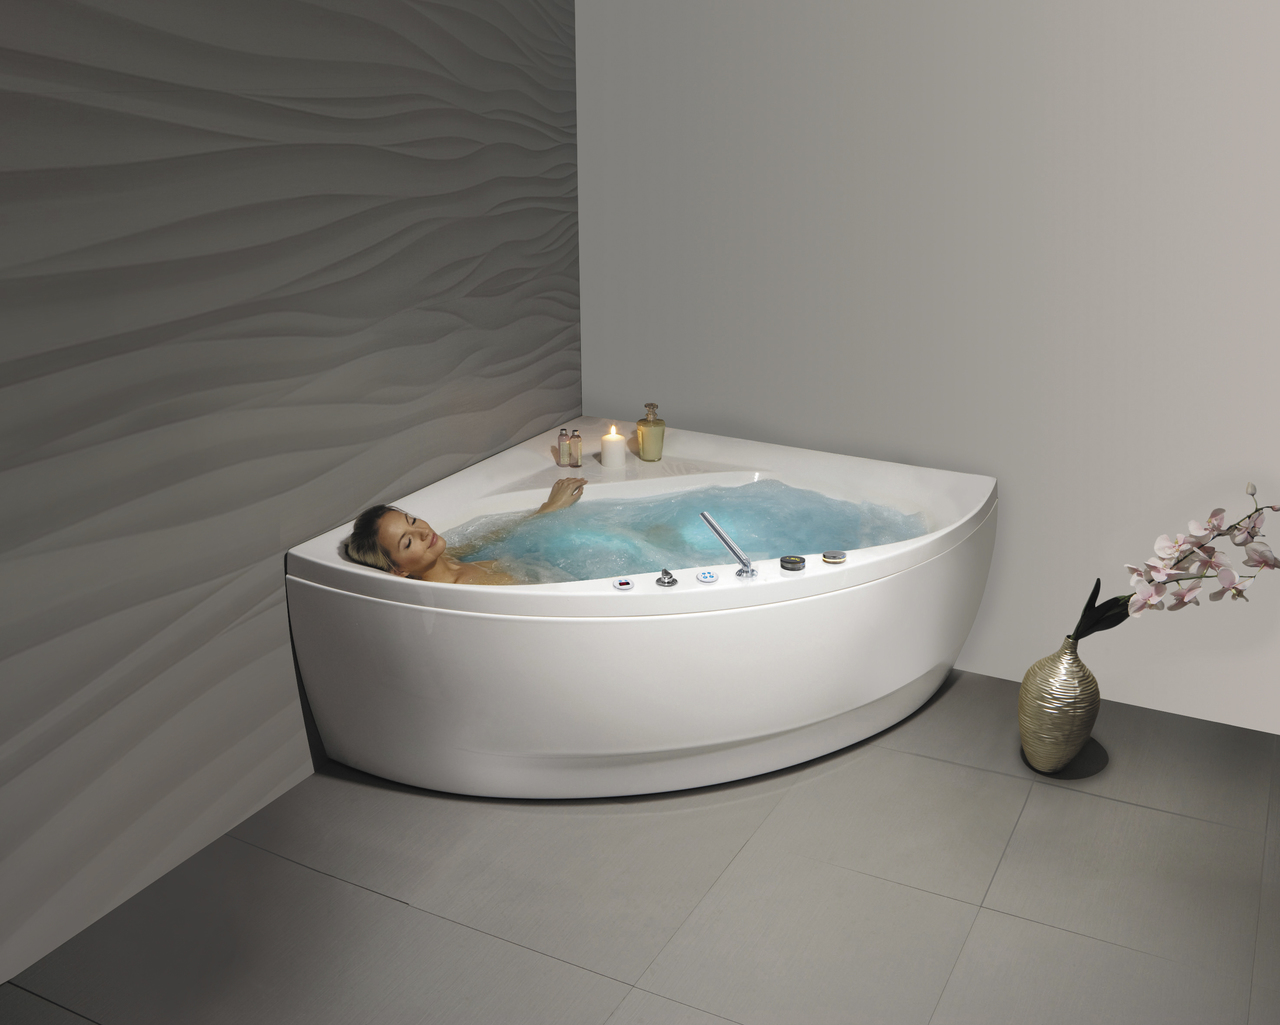 Aquatica Olivia Wht HydroRelax Jetted Bathtub US Version